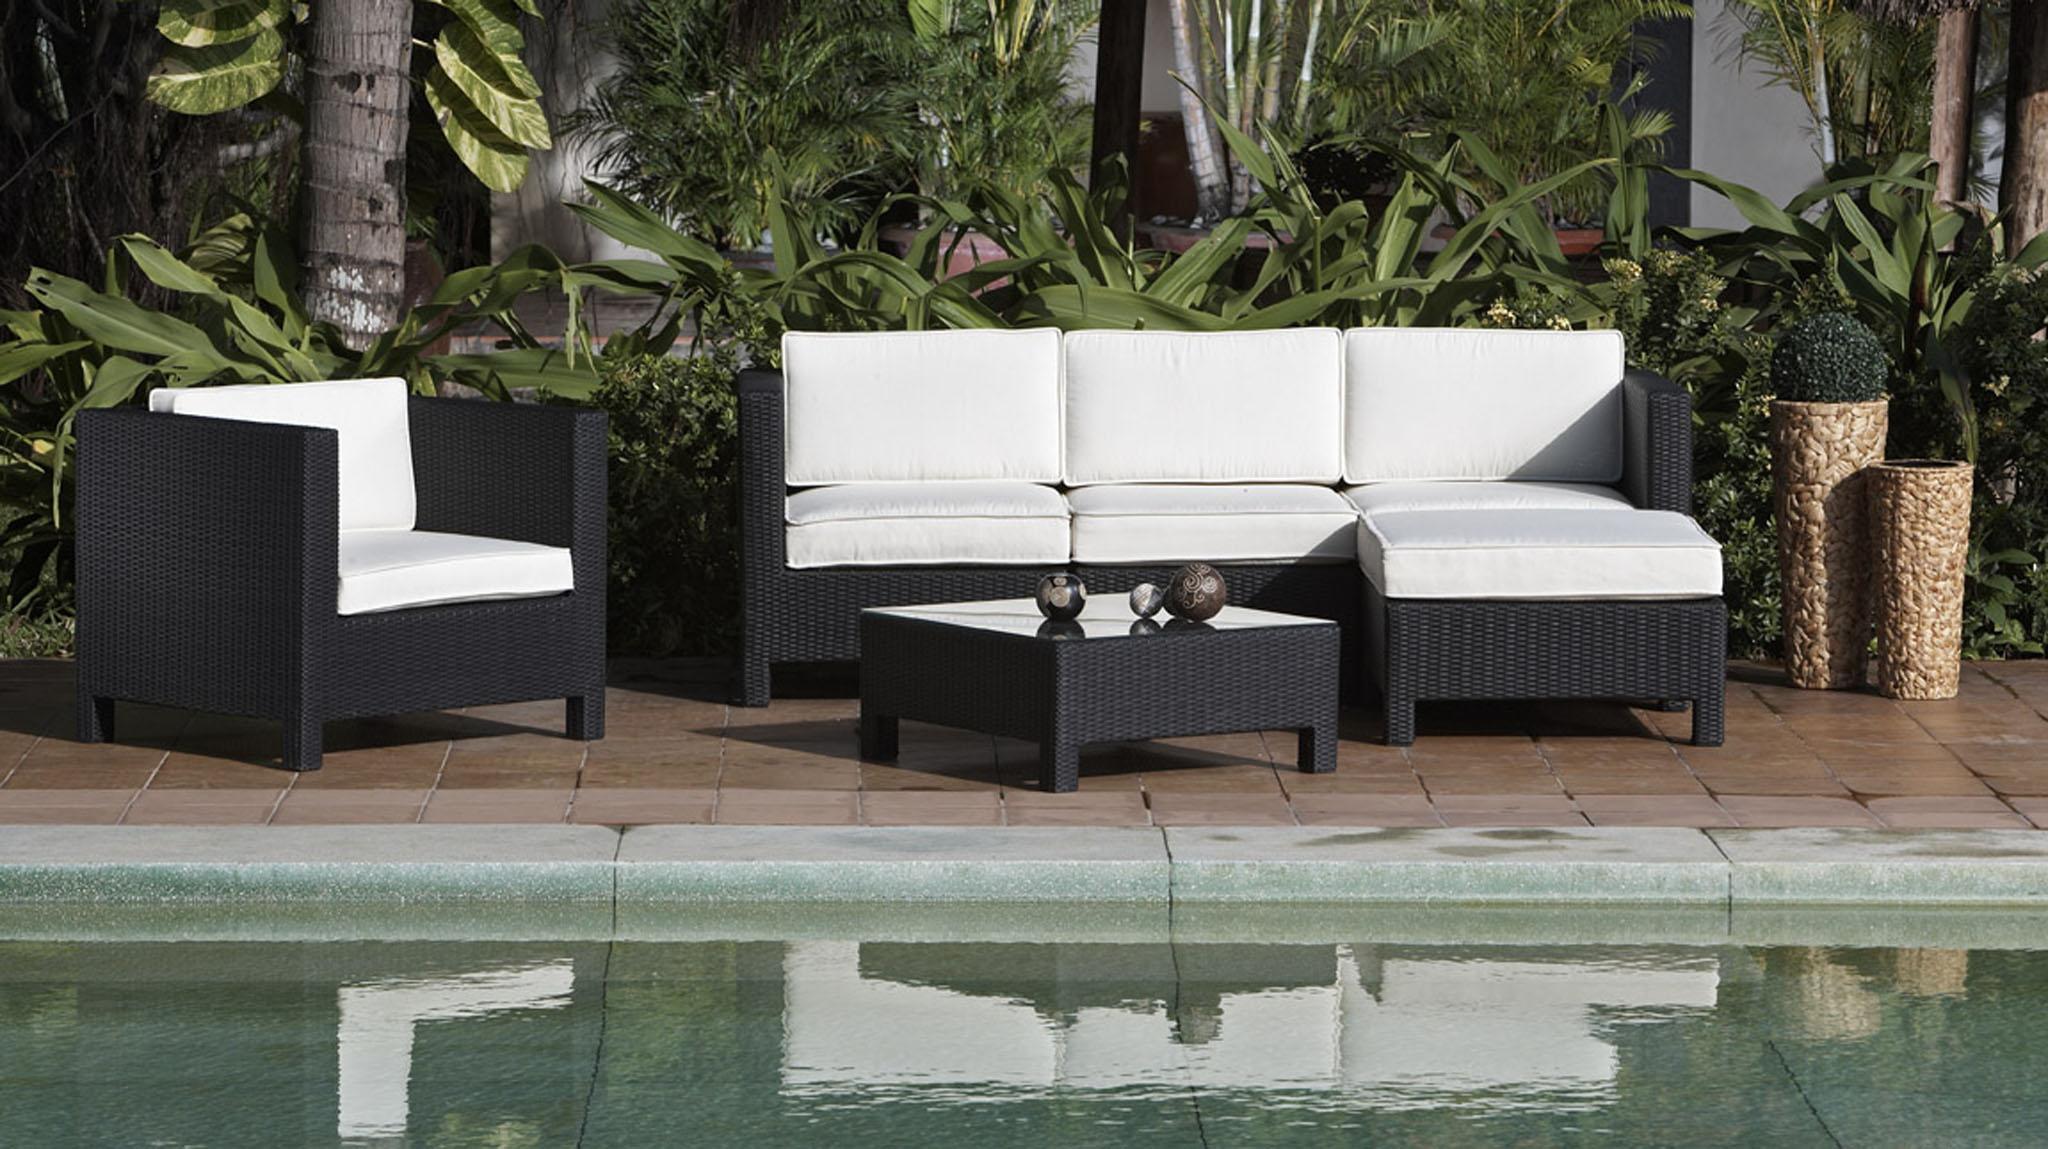 chez conforama les meubles de jardin sont en f tes presseportal. Black Bedroom Furniture Sets. Home Design Ideas